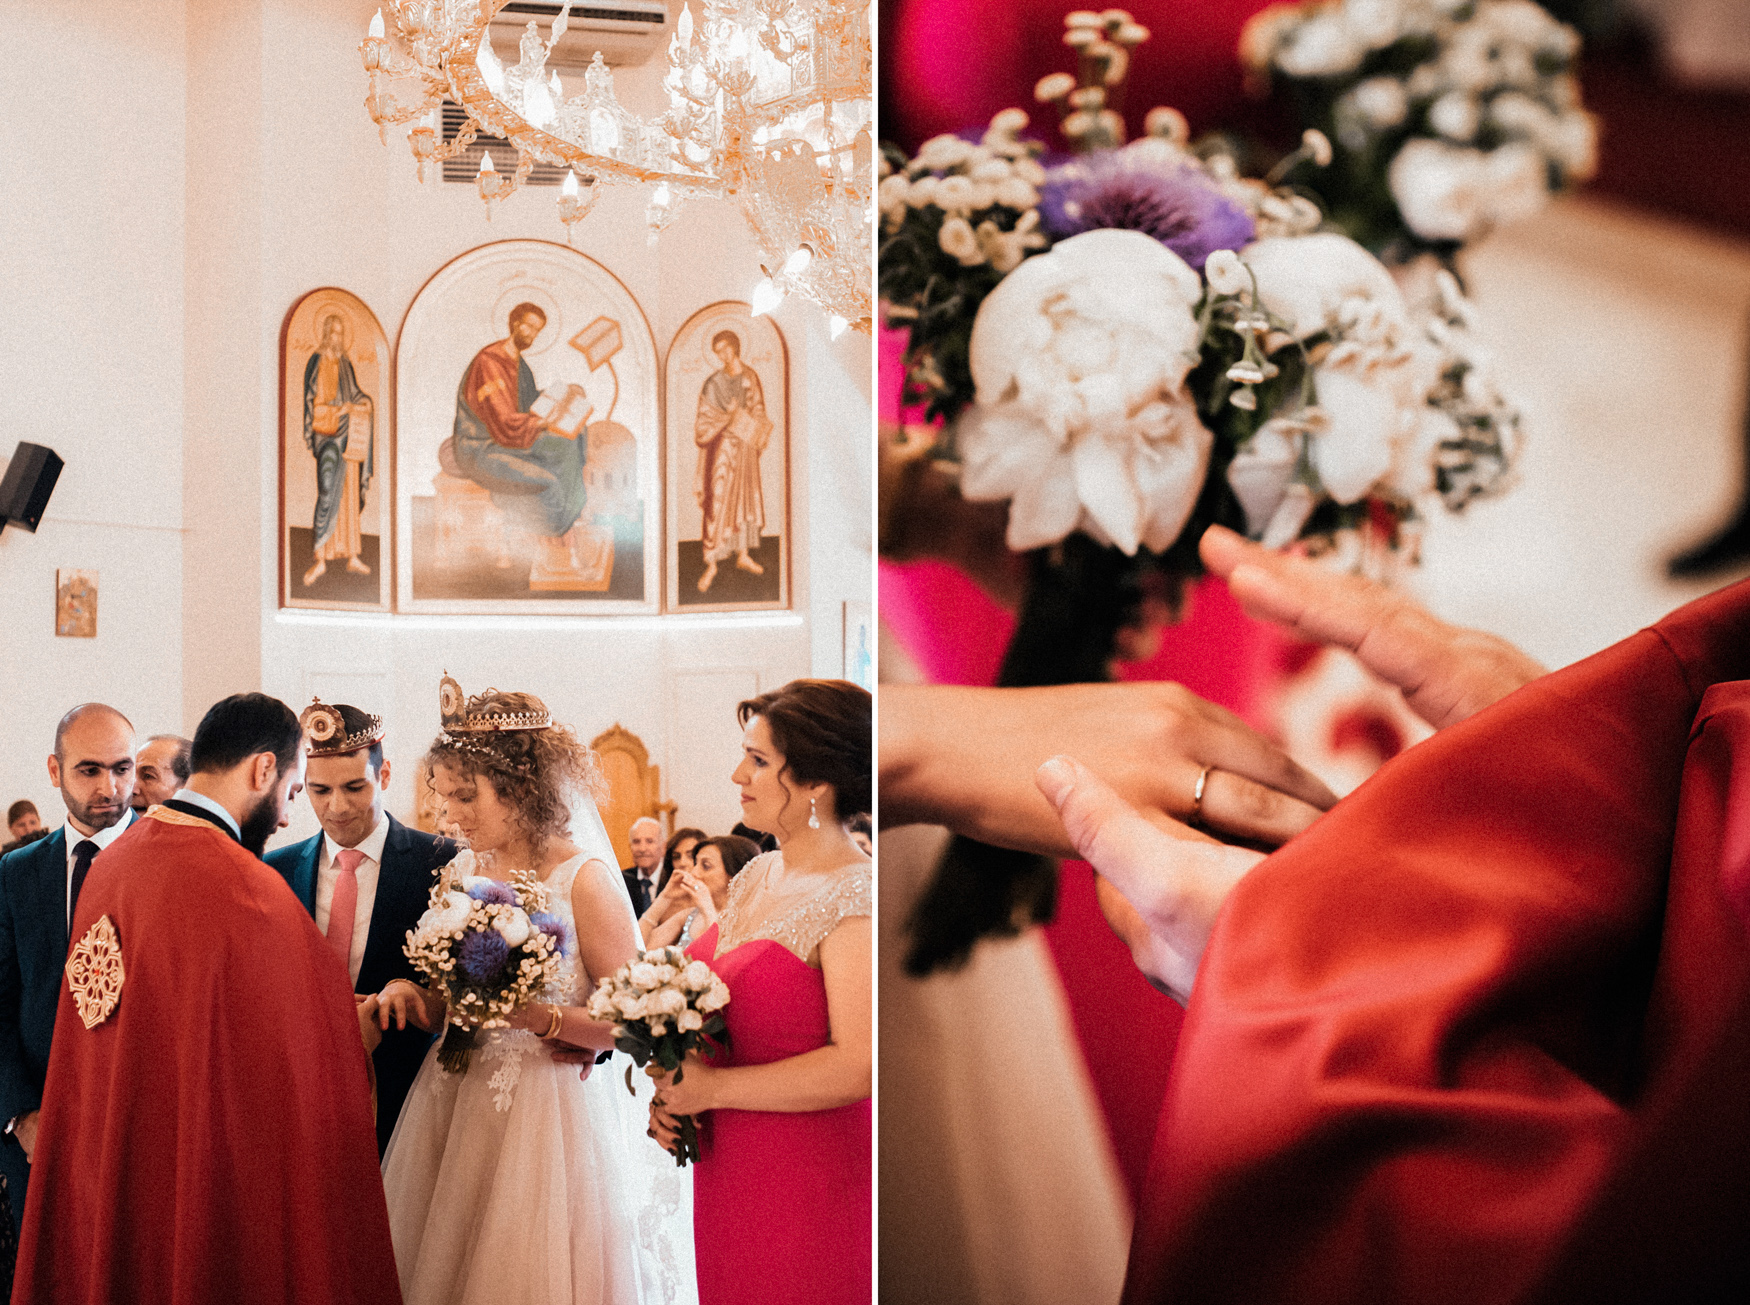 LR3 byblos beirut church wedding ceremony lebanon 010.jpg